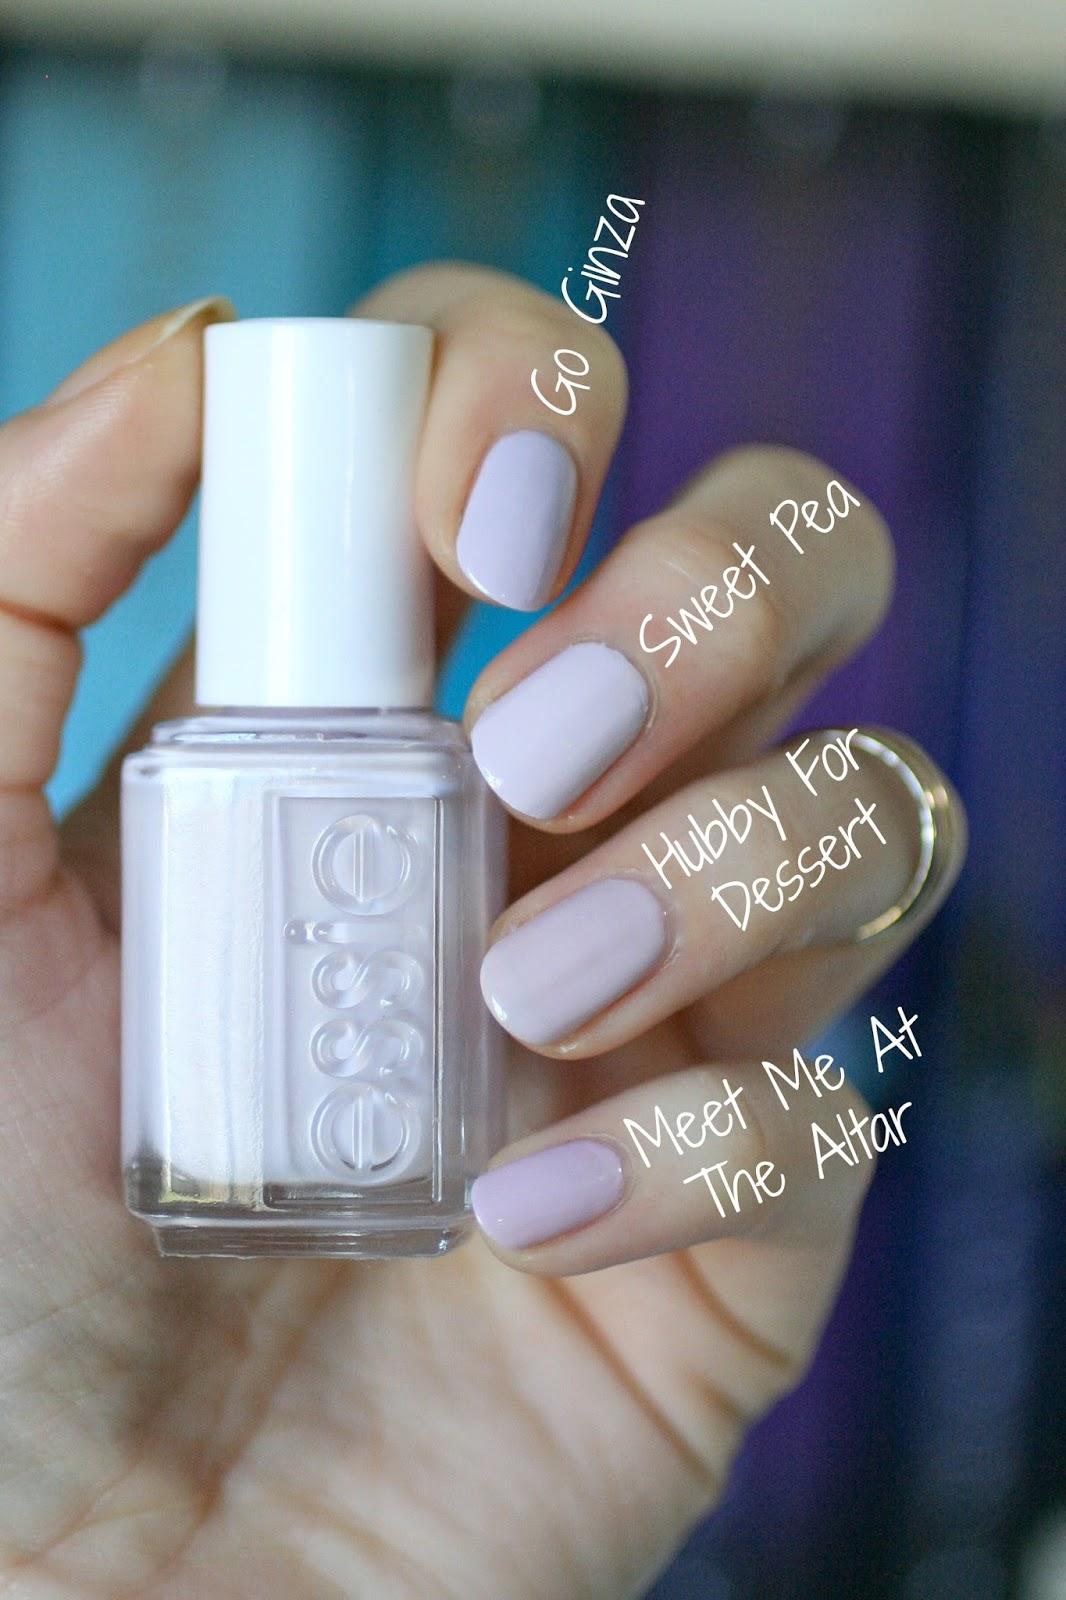 The Nail Polish Shades I Created With Essie! | Essie Envy